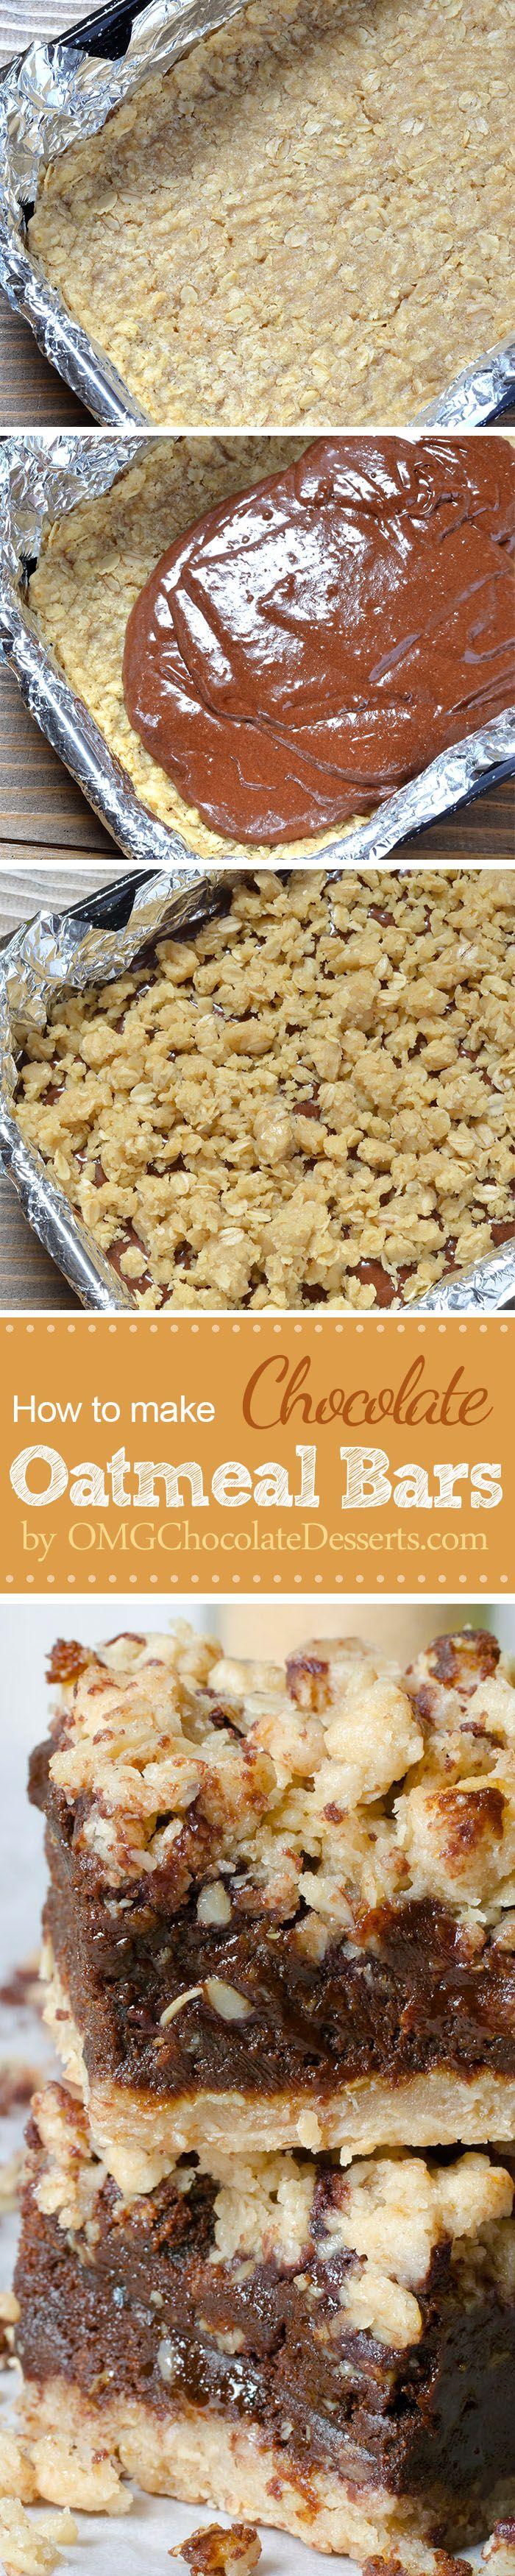 Chocolate Oatmeal Bars | OMGChocolateDesserts.com | #oatmeal #chocolate #bars